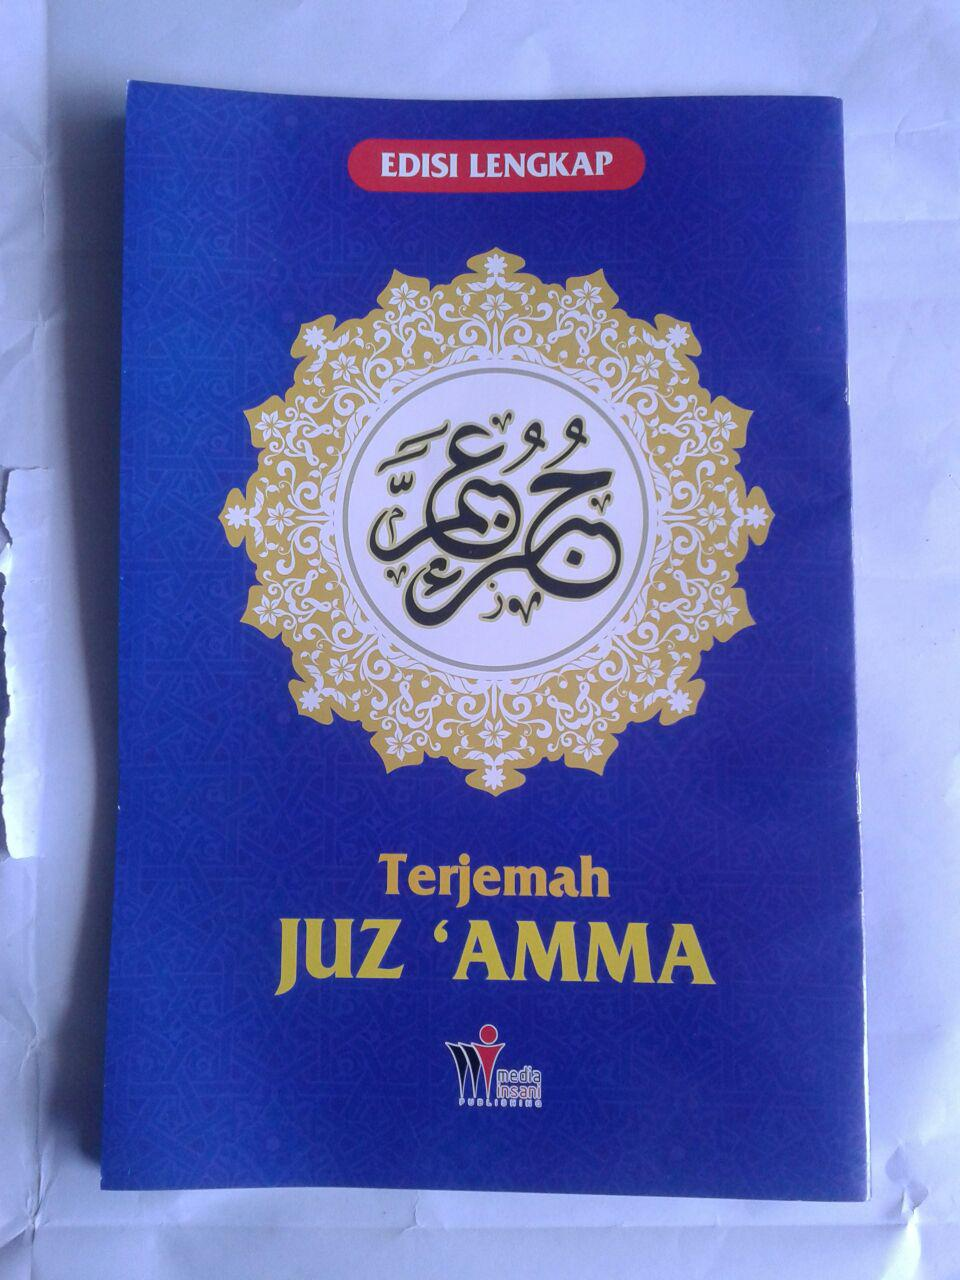 Buku Terjemah Juz Amma Disertai Lafal Transliterasi Ukuran A4 cover